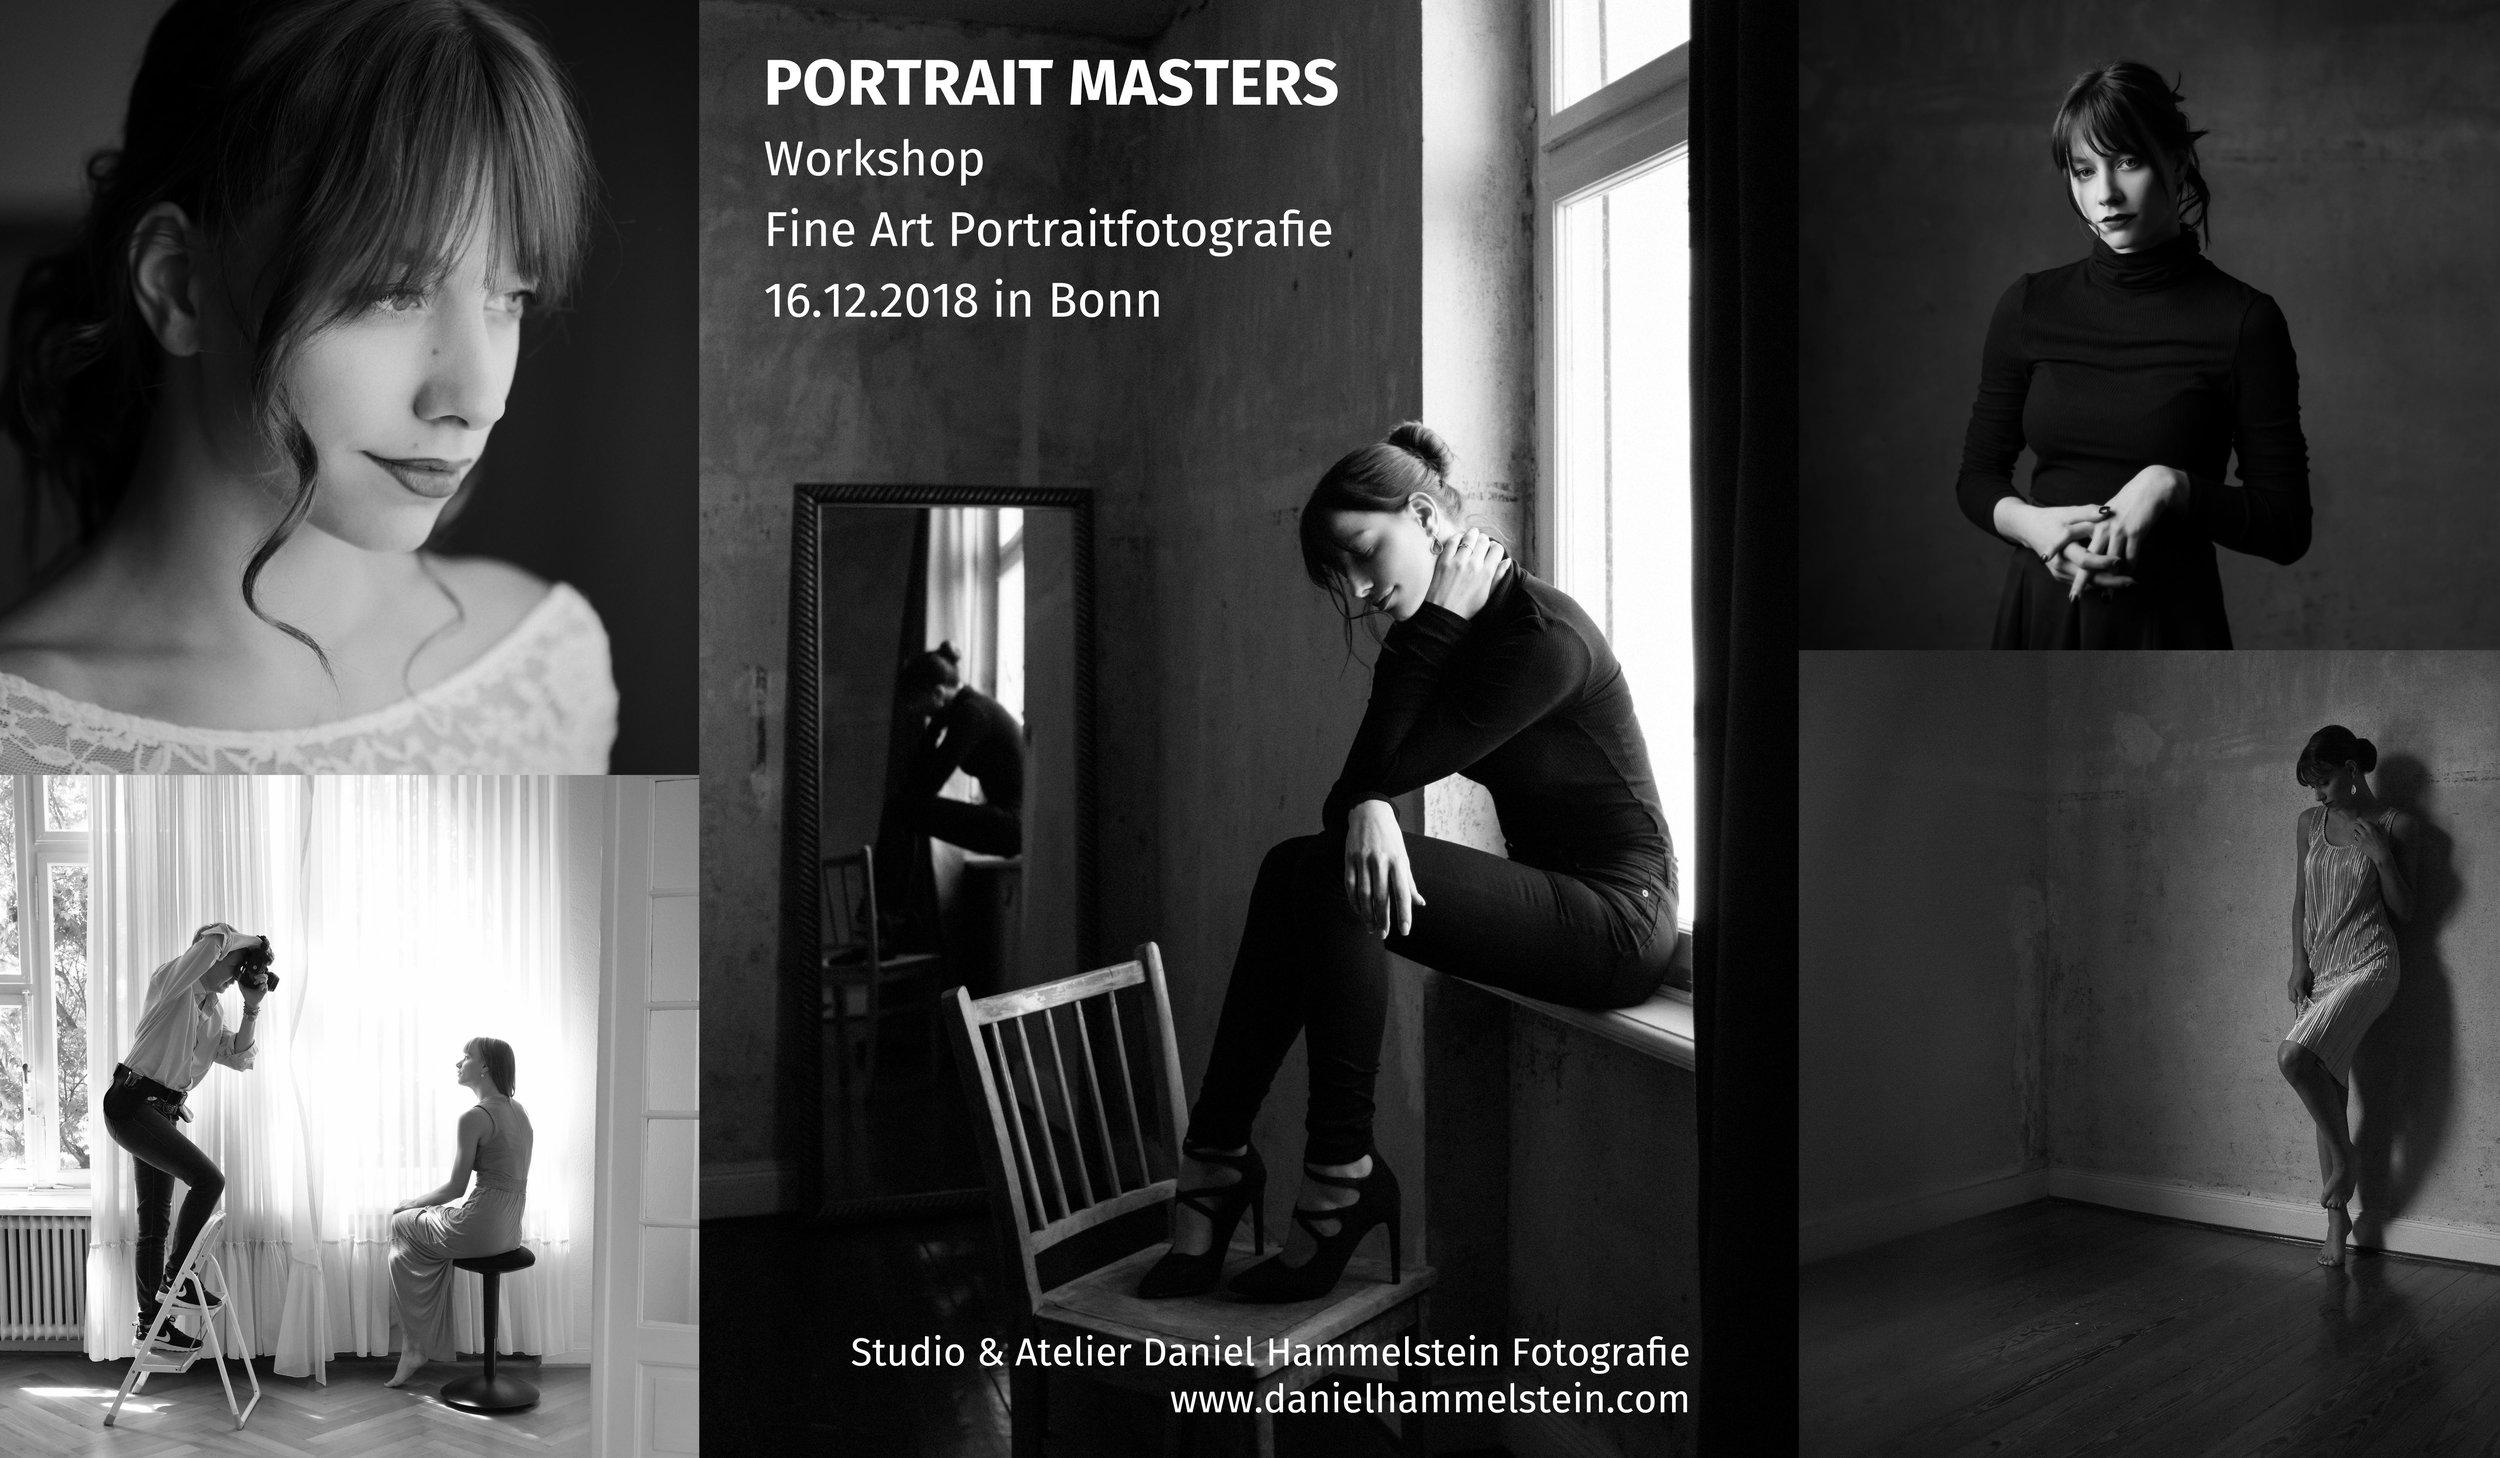 Portrait Workshop Portraitfotografie Schwarzweissfotografie Fotoworkshop Fotokurs Bonn Köln Düsseldorf NRW Dezember 2018.jpg